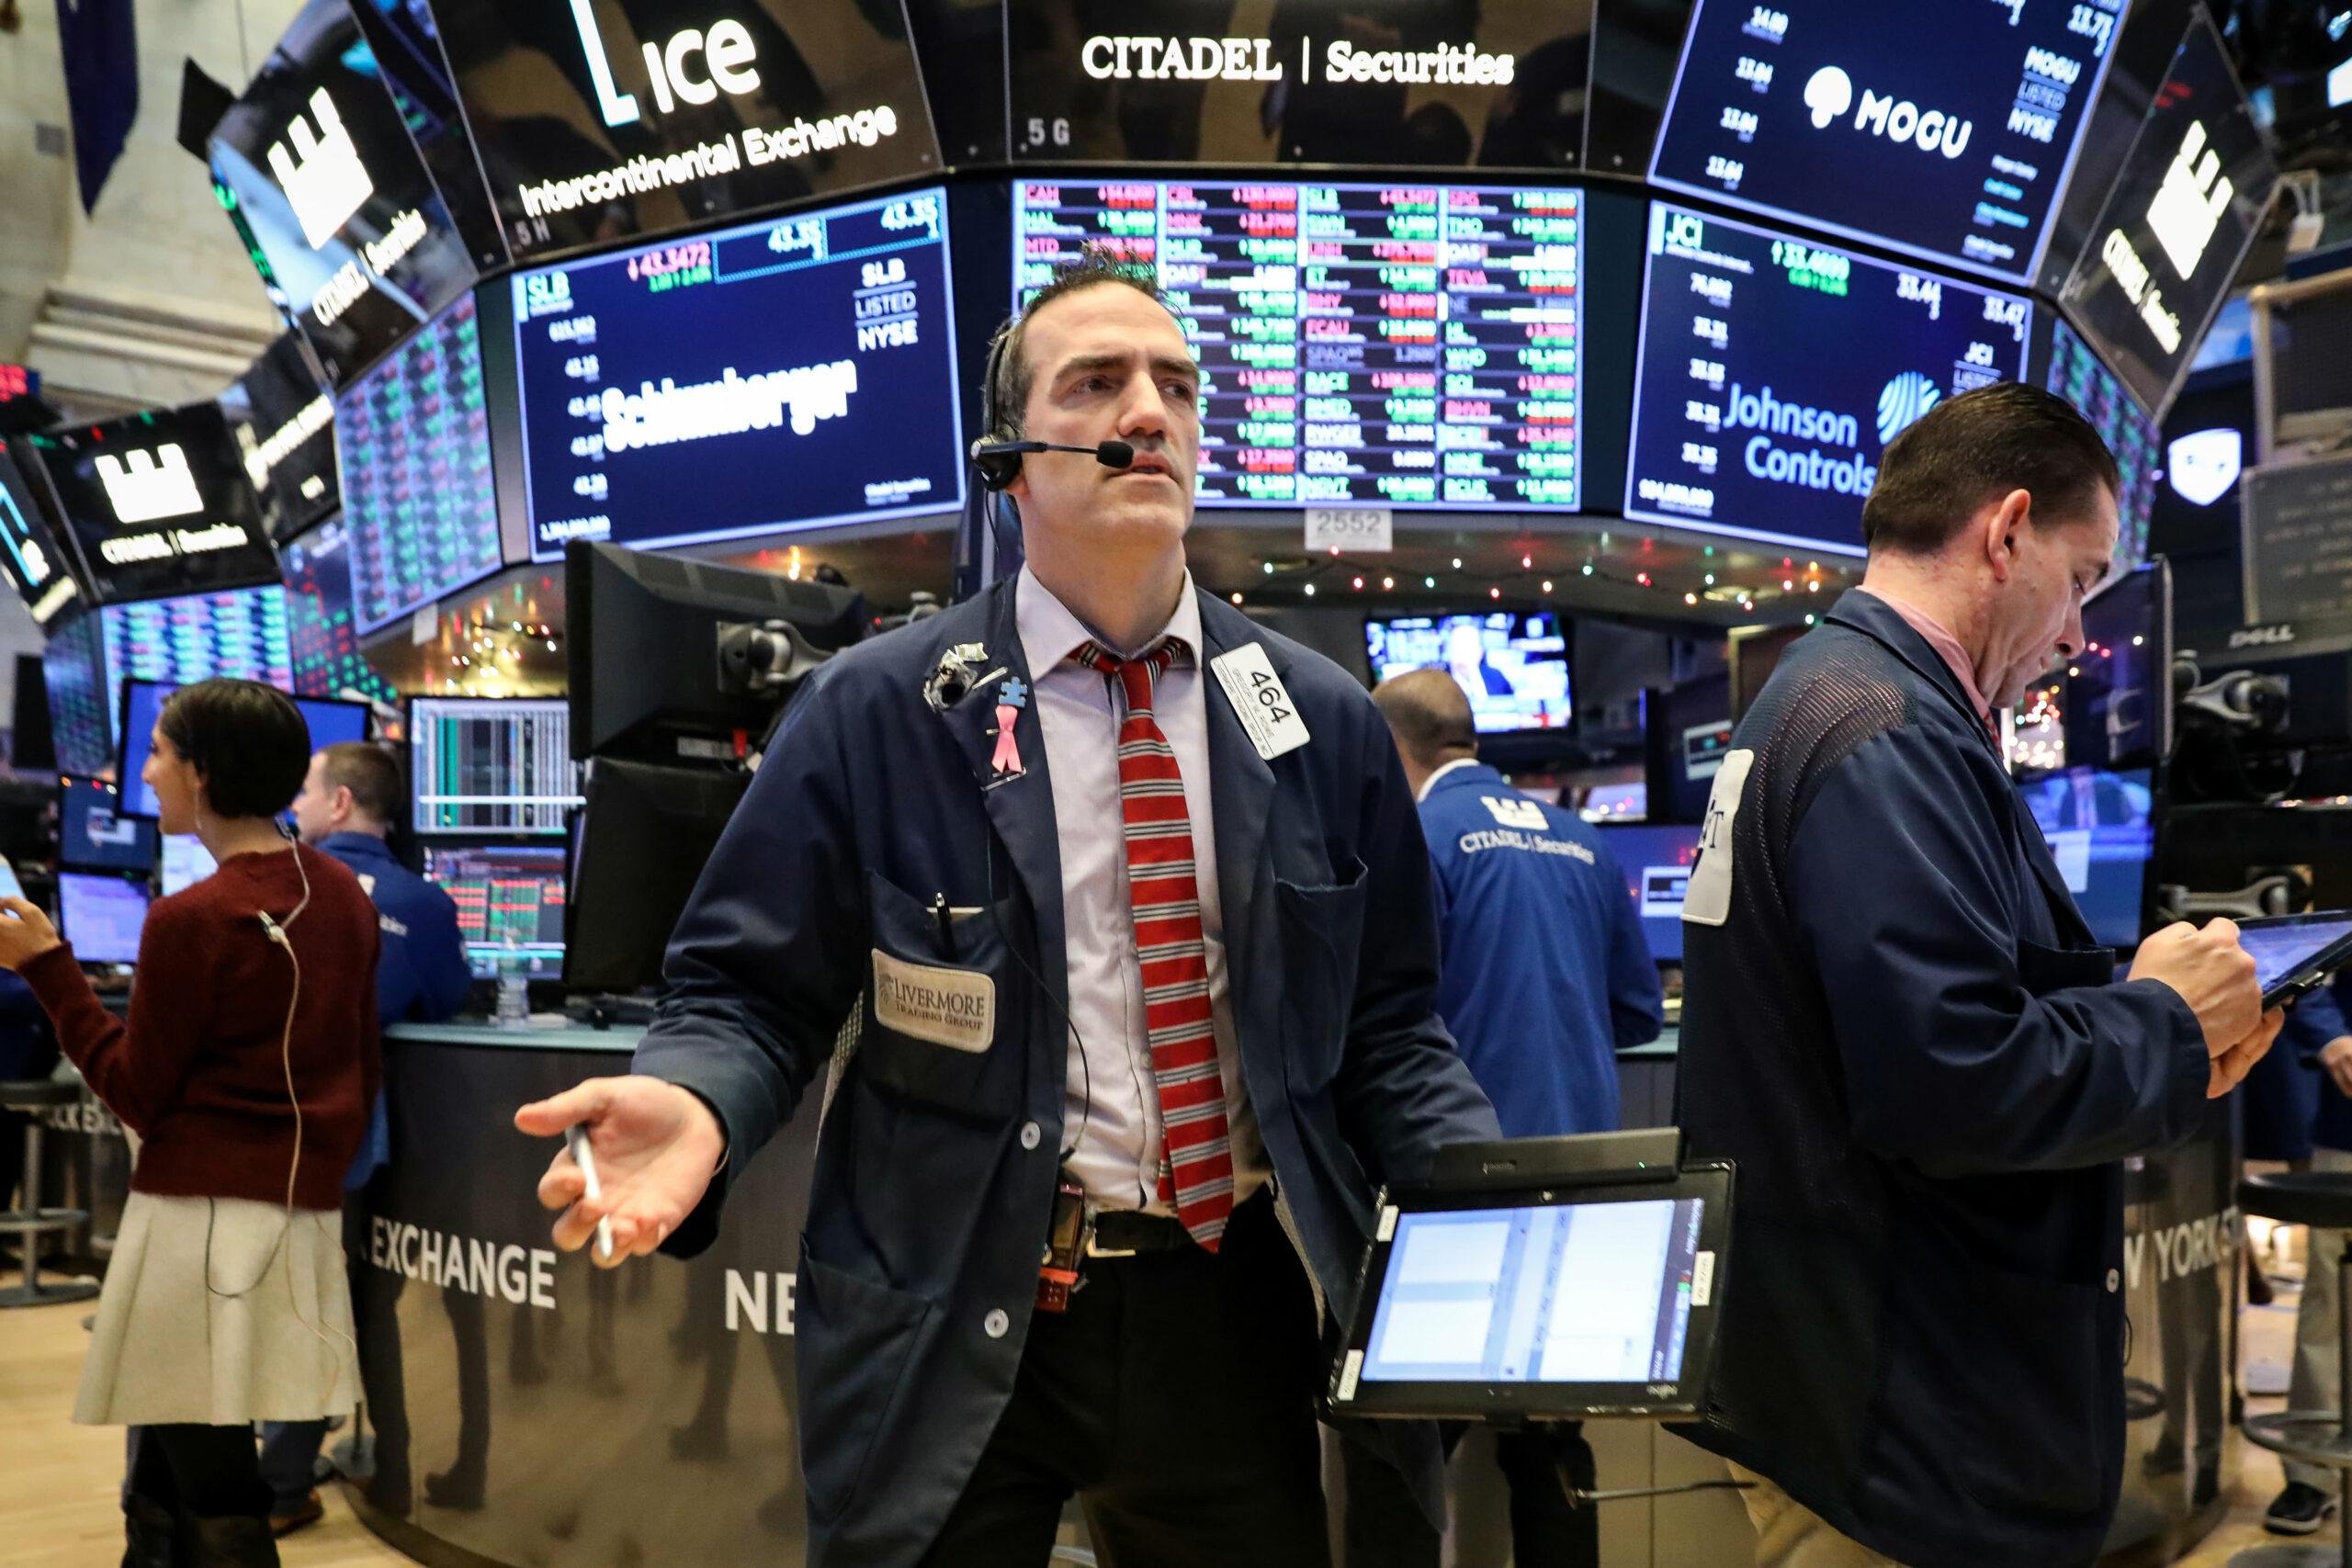 Dow rebounds 250 points as markets attempt to halt September slide